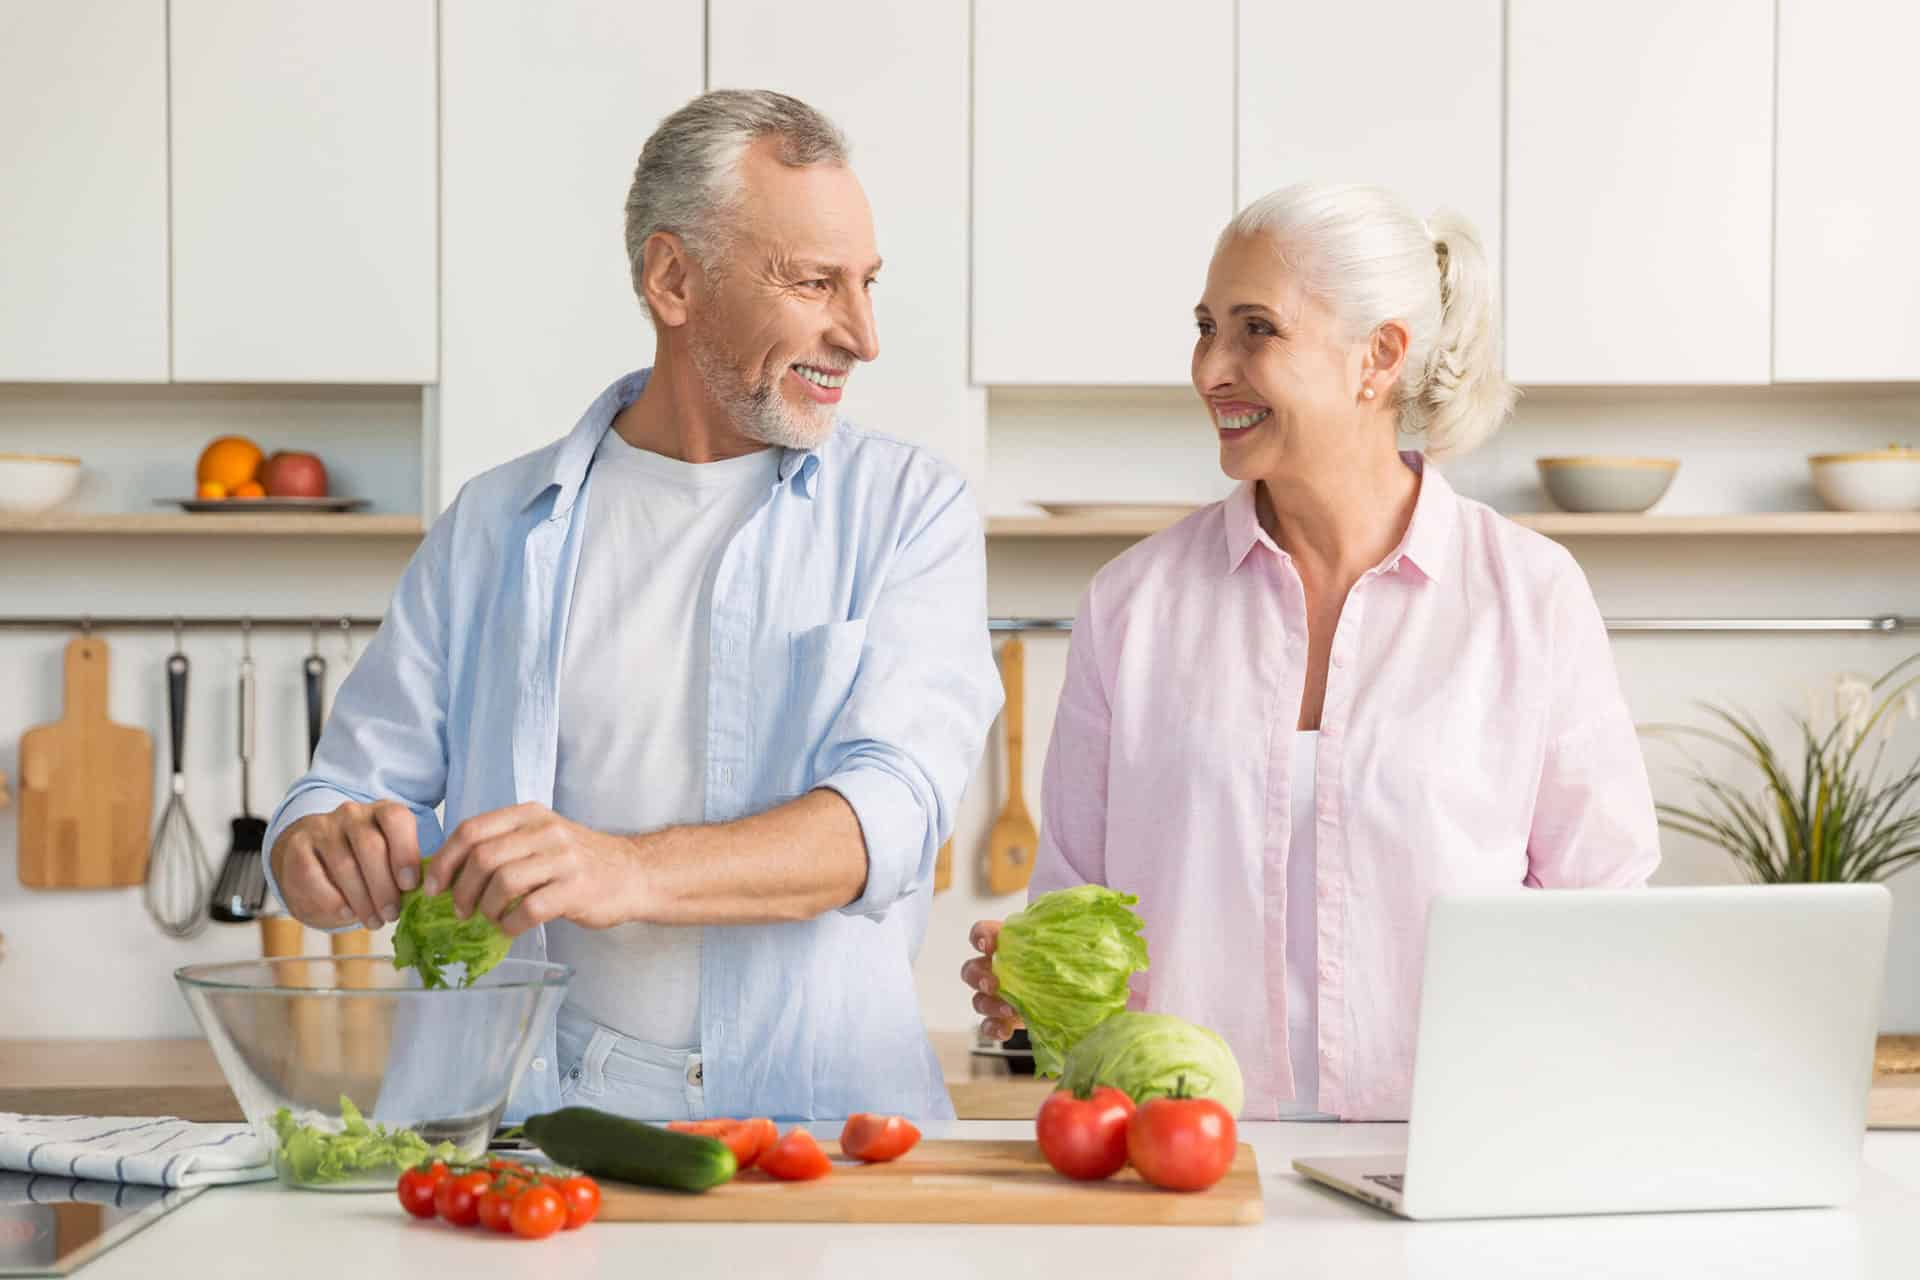 Mature-couple-preparing-healthy-meals